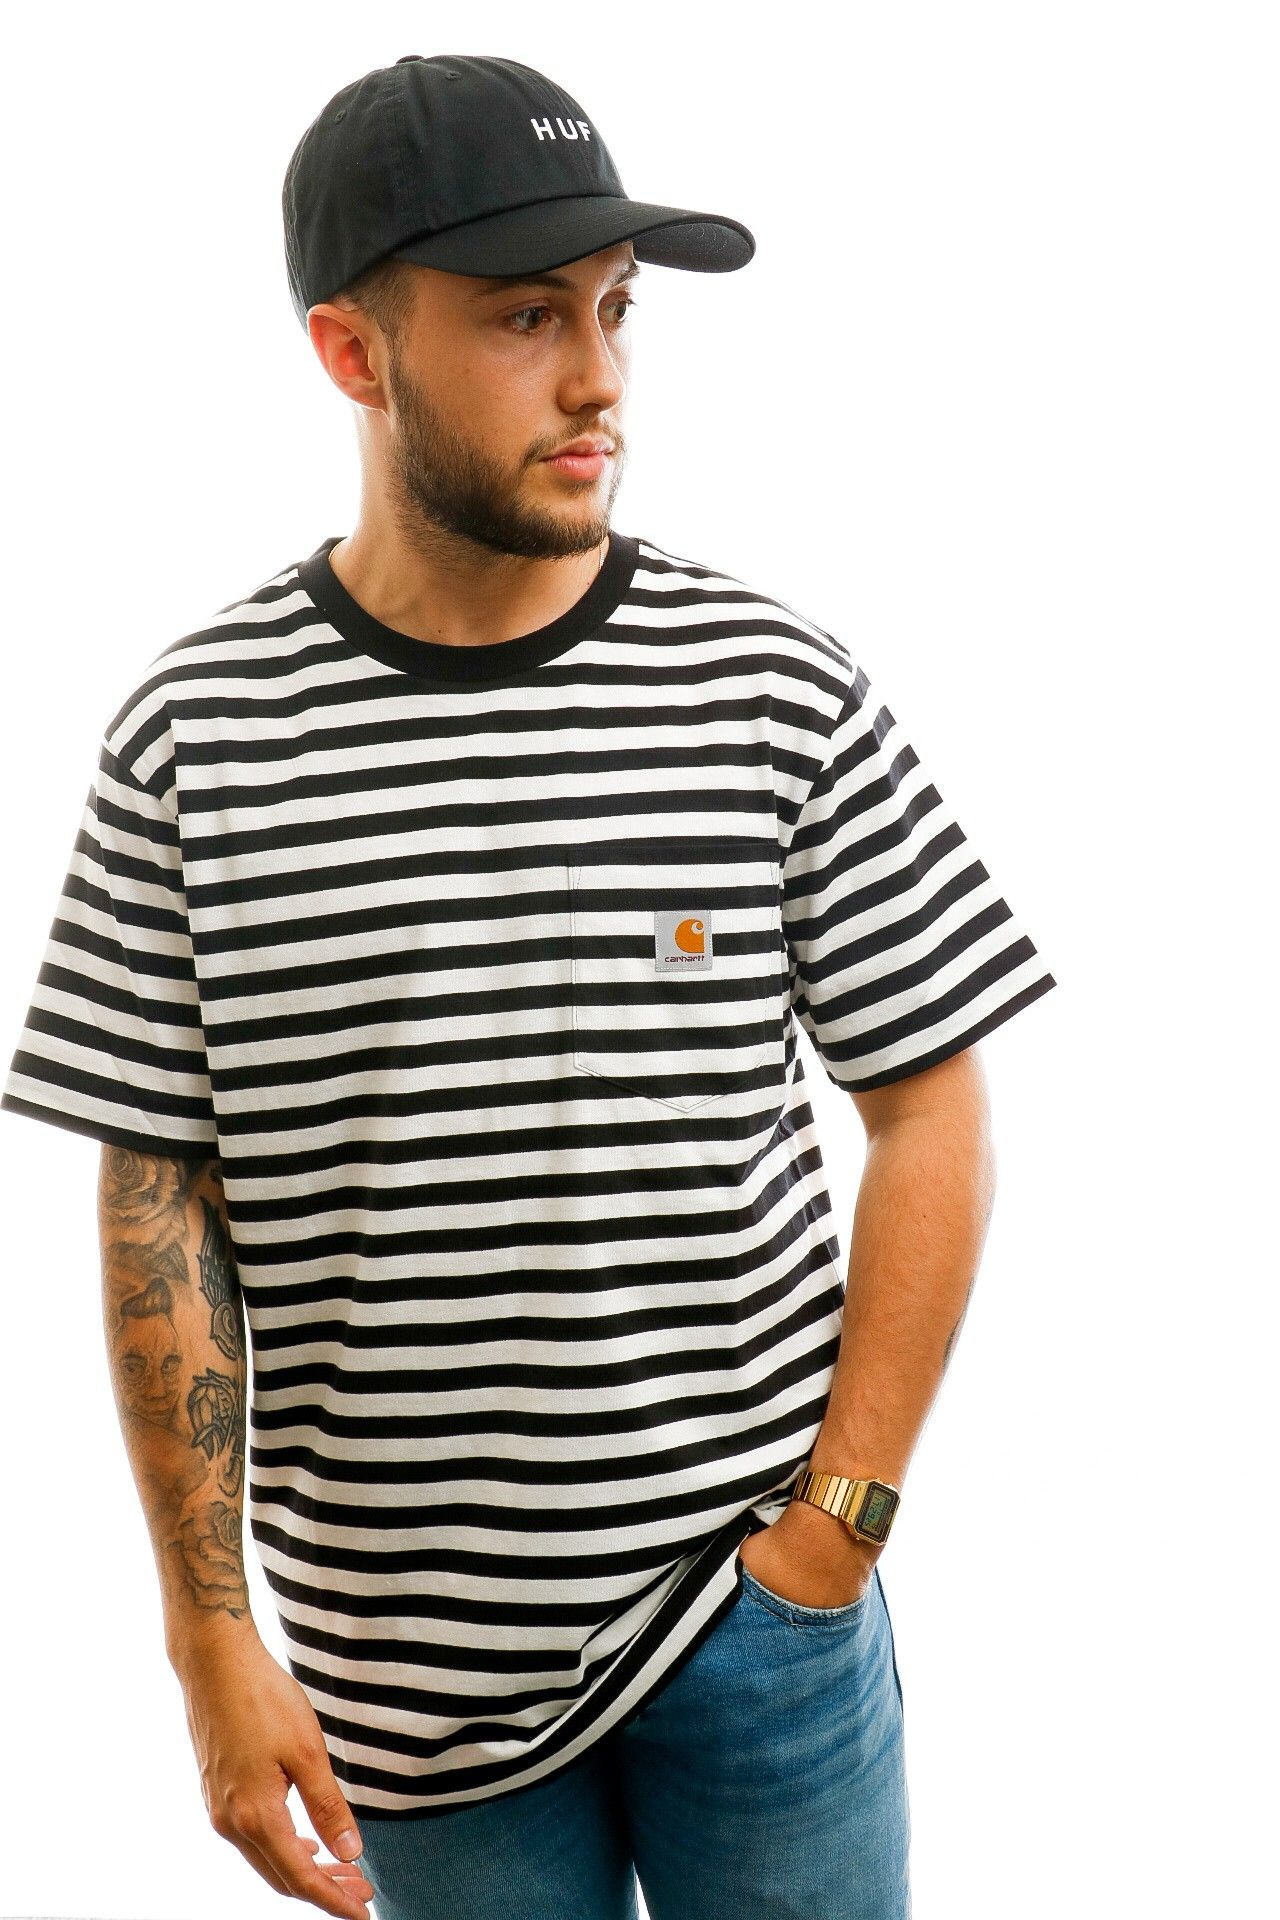 Afbeelding van Carhartt T-shirt S/S Parker Pocket T-Shirt Parker Stripe, Black / Wax I028406